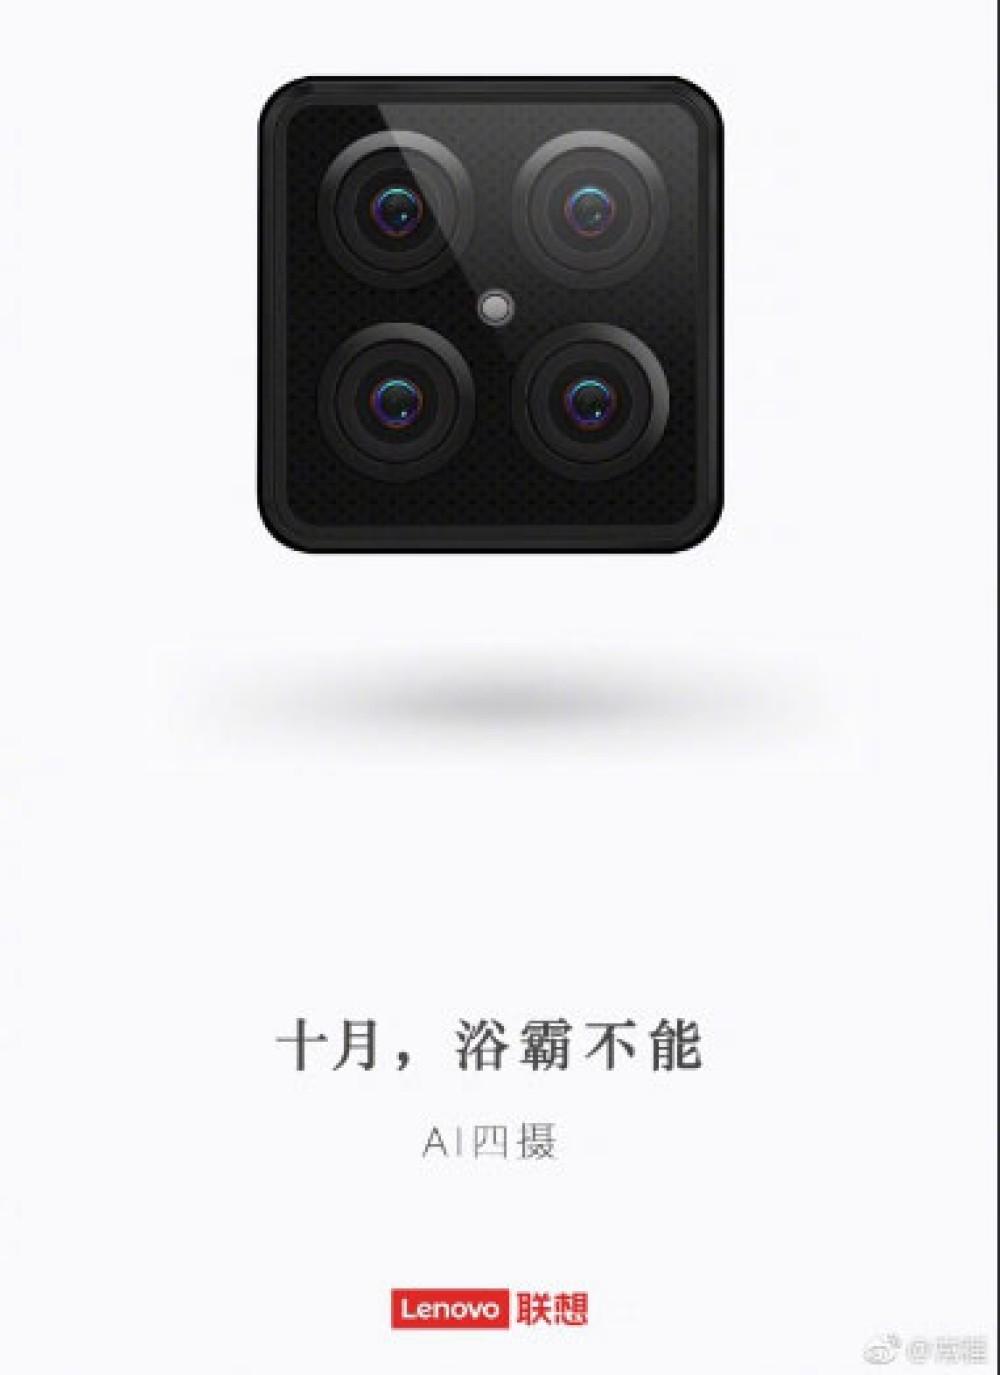 Lenovo Z5 Pro: Νέο teaser αποκαλύπτει τετραπλή κάμερα στο πίσω μέρος